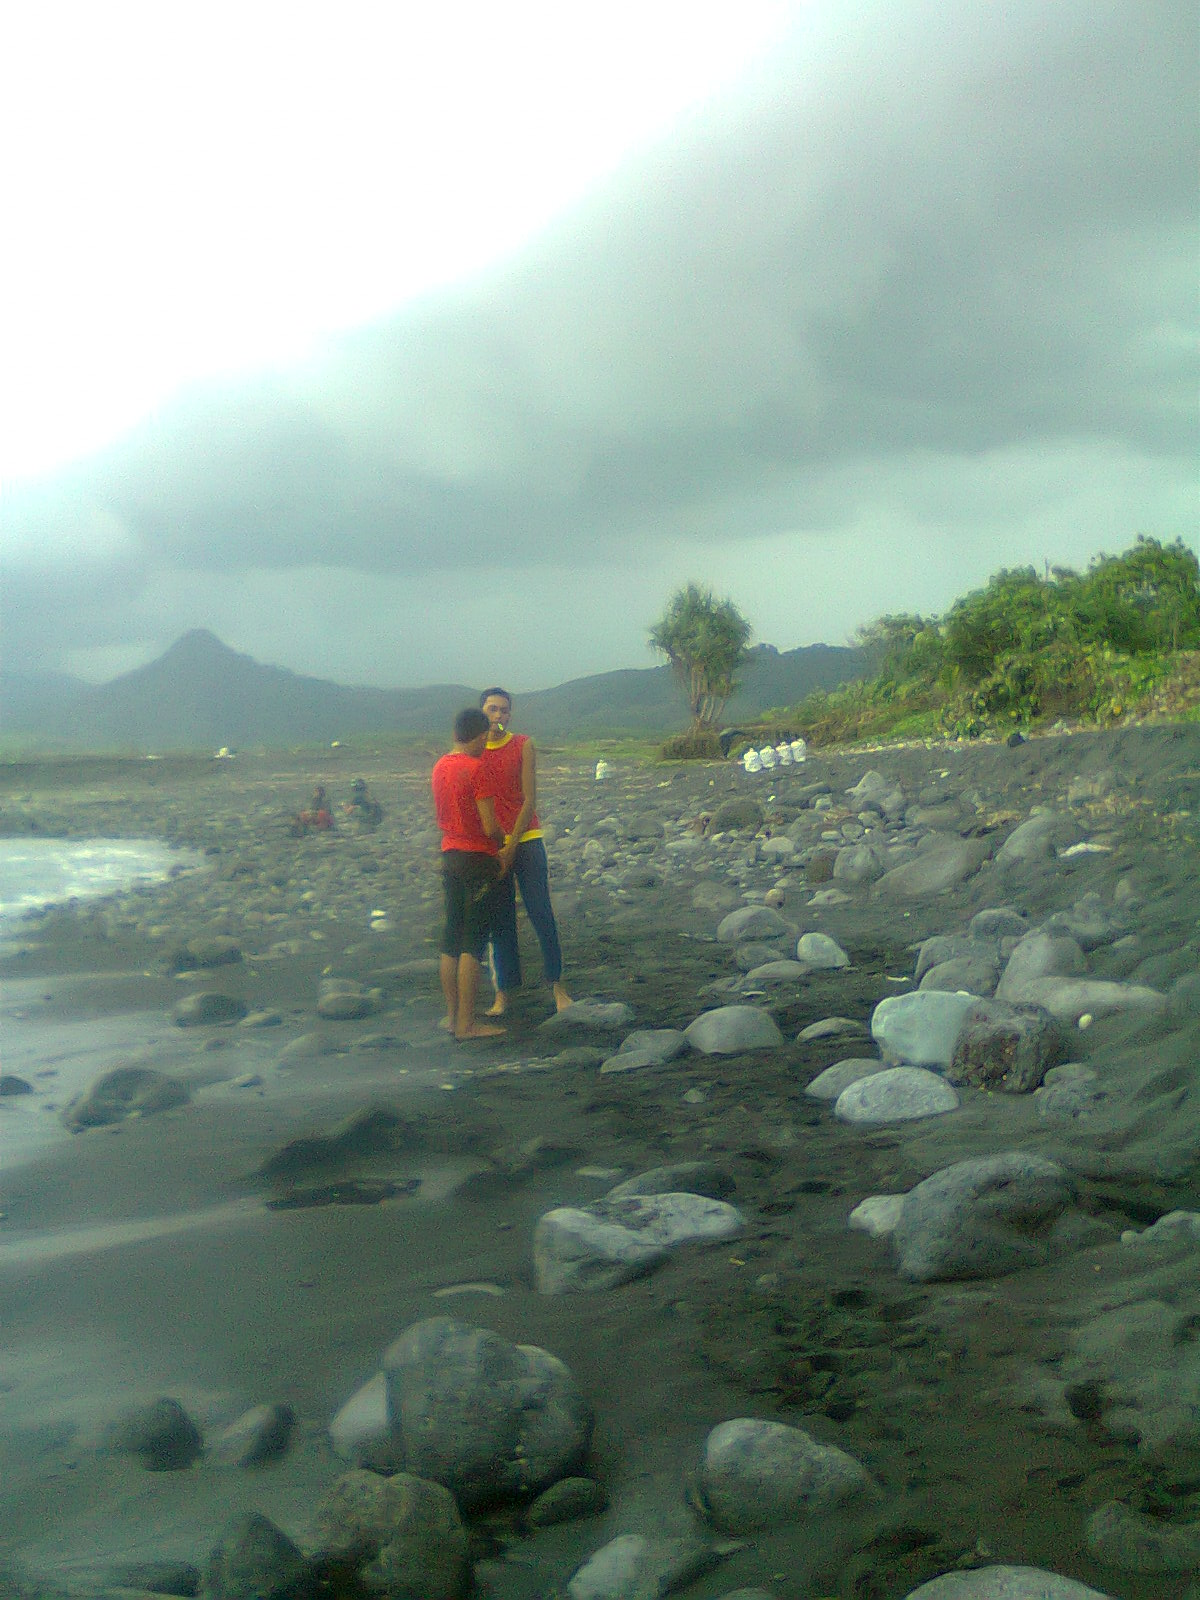 Pantai Bambang Lumajang Sichesse Terletak Desa Pasirian Terkenal Keindahan Pasirnya